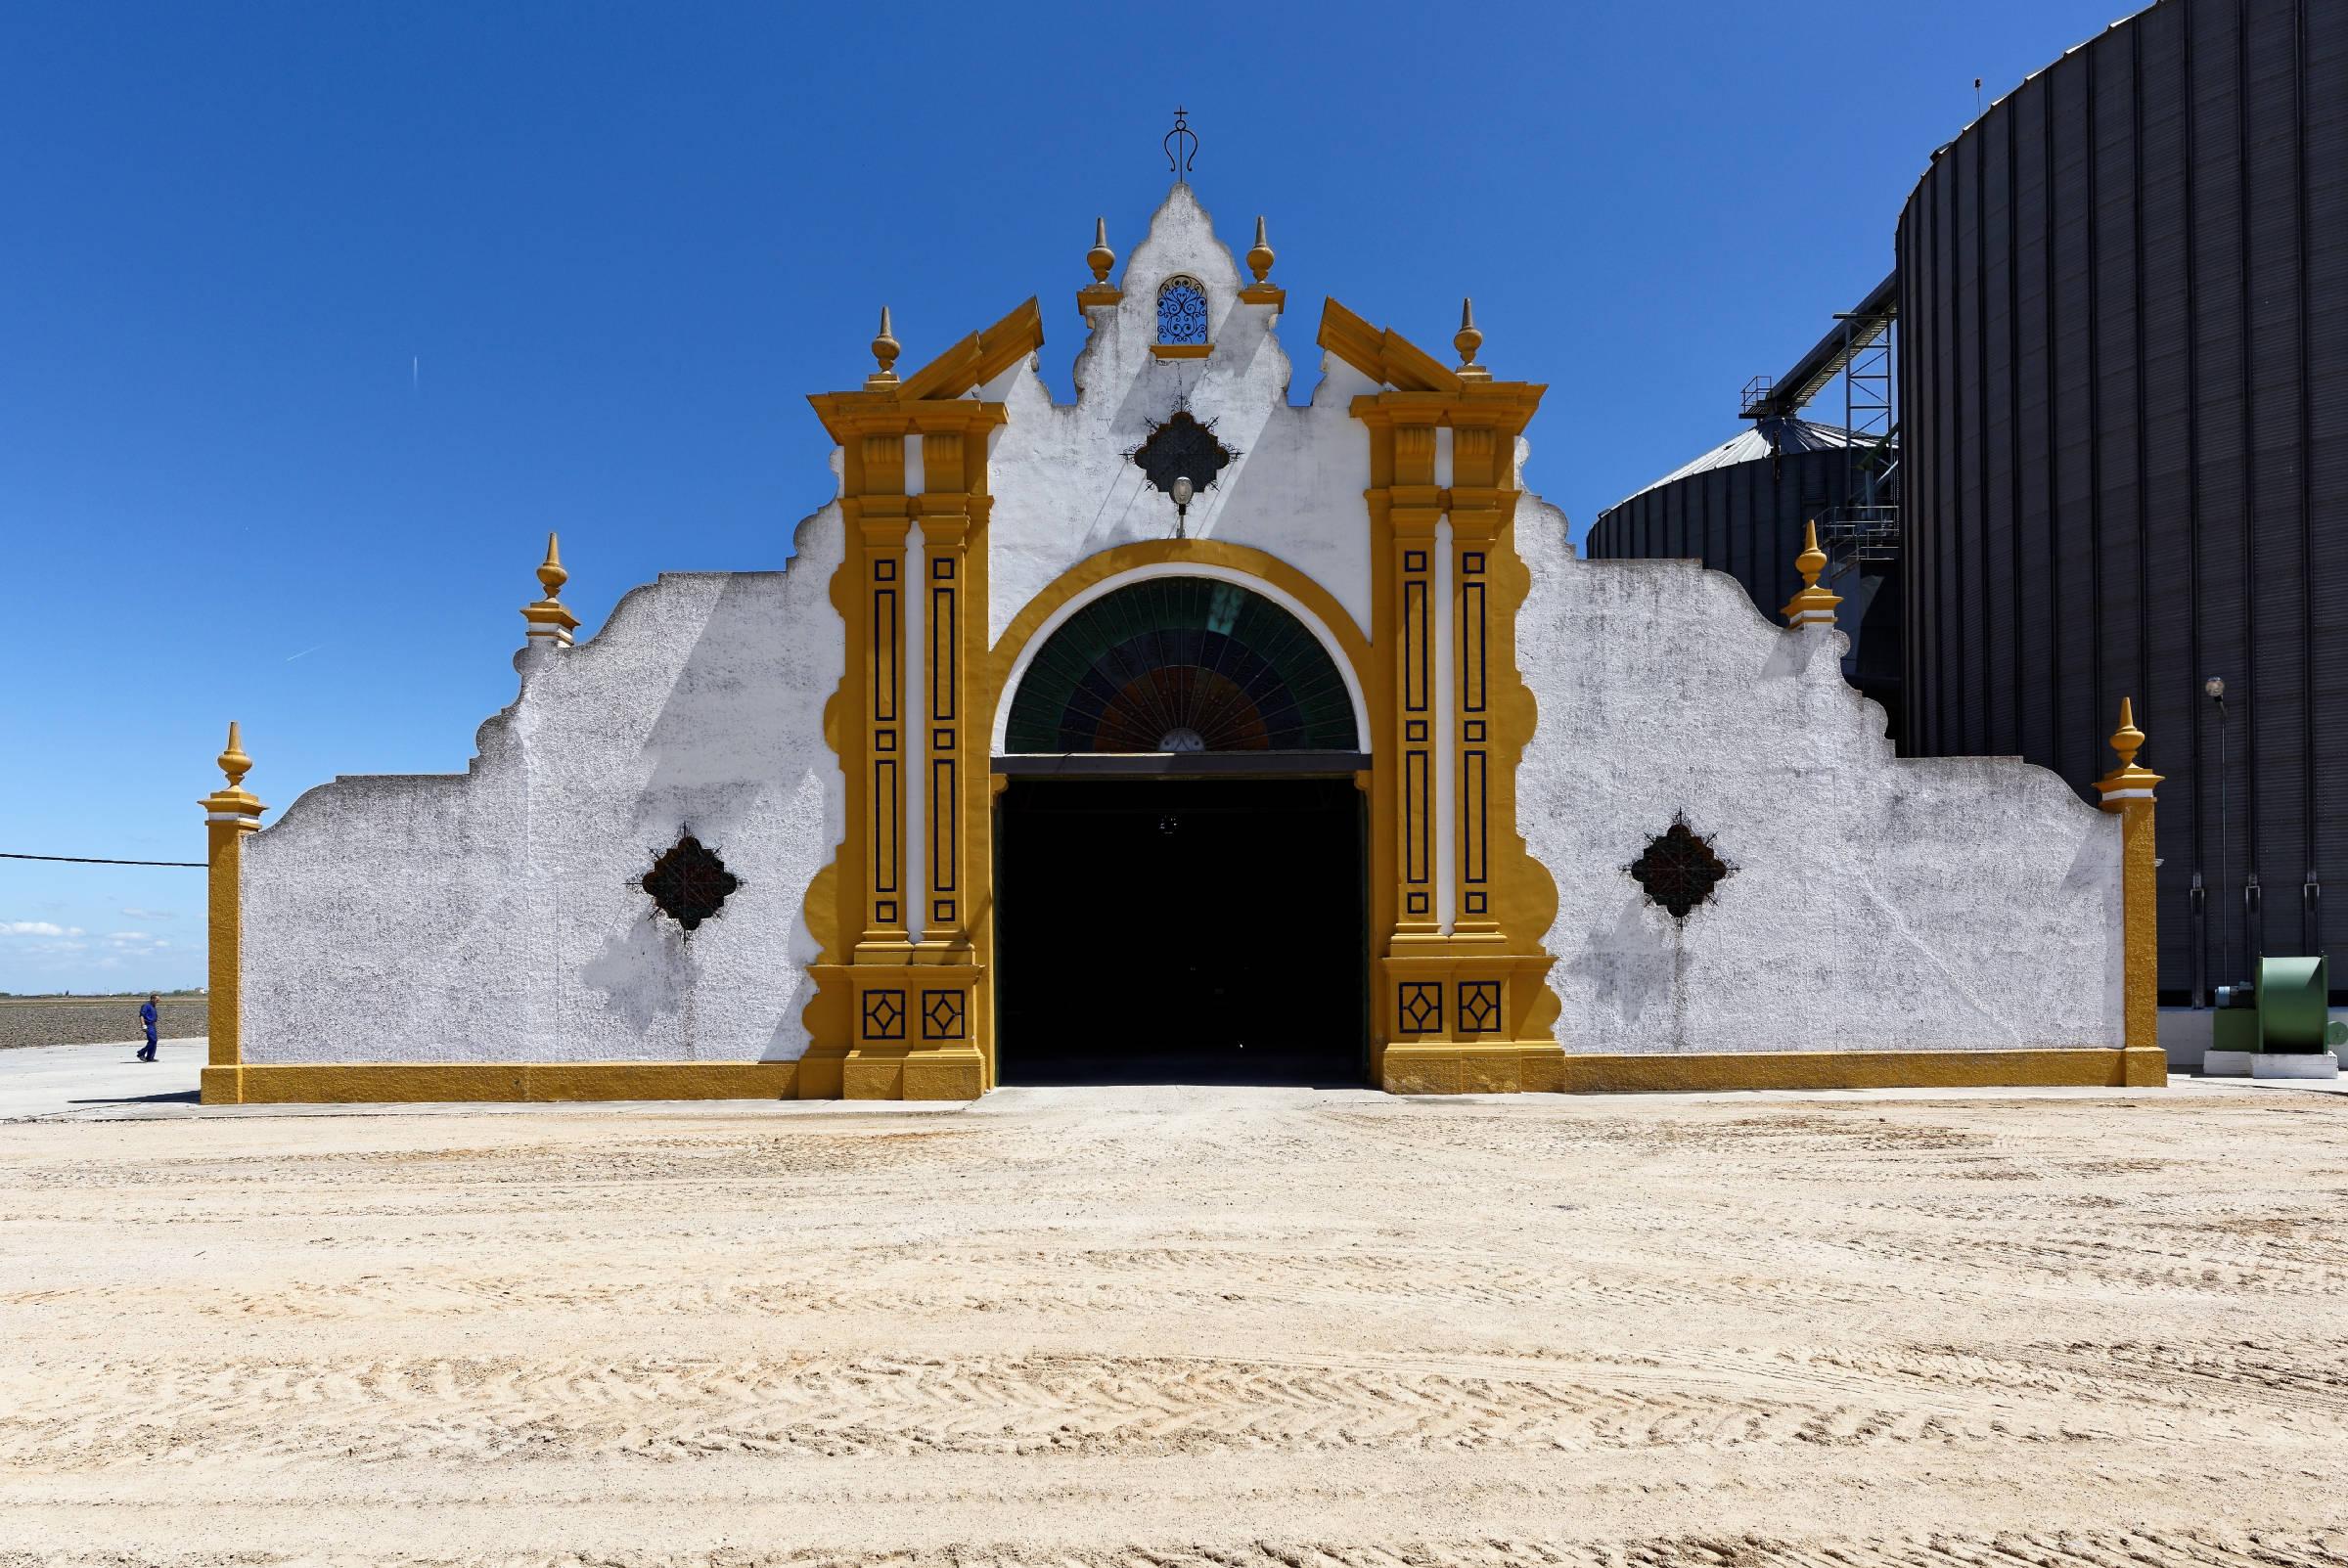 160414-Isla minima - Escobar (Andalousie) (35)